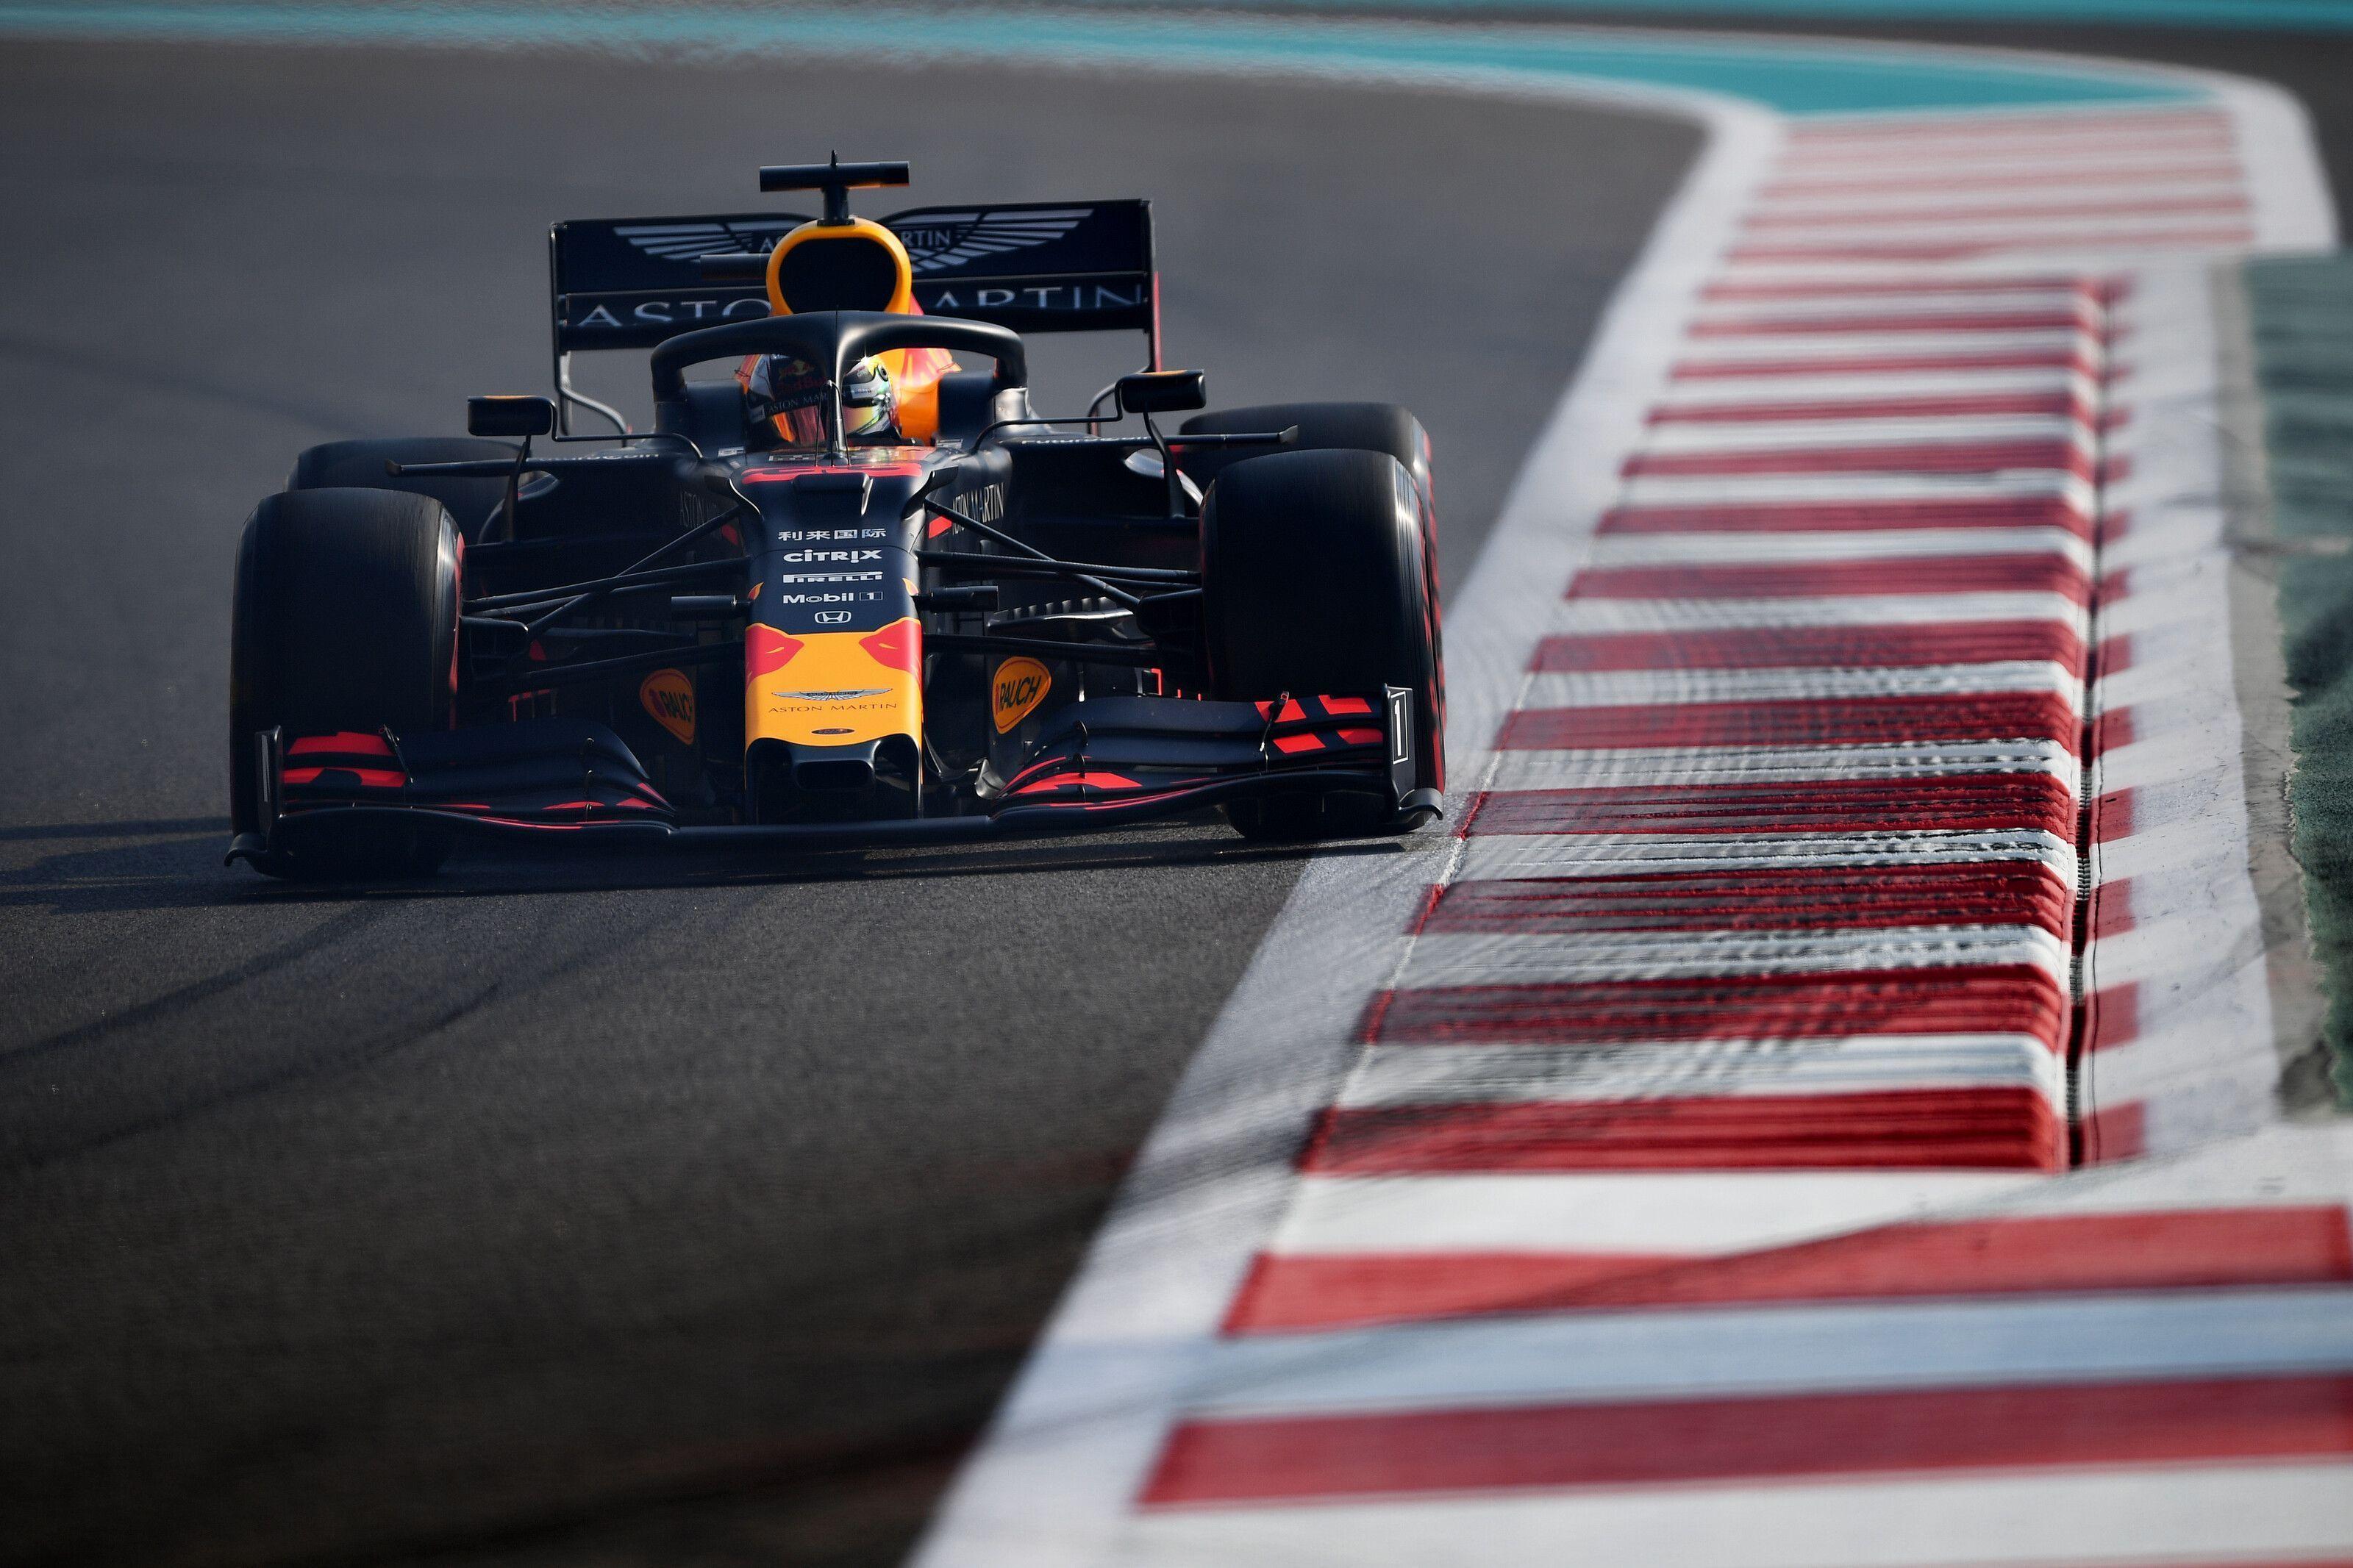 Max Verstappen, Abu Dhabi GP